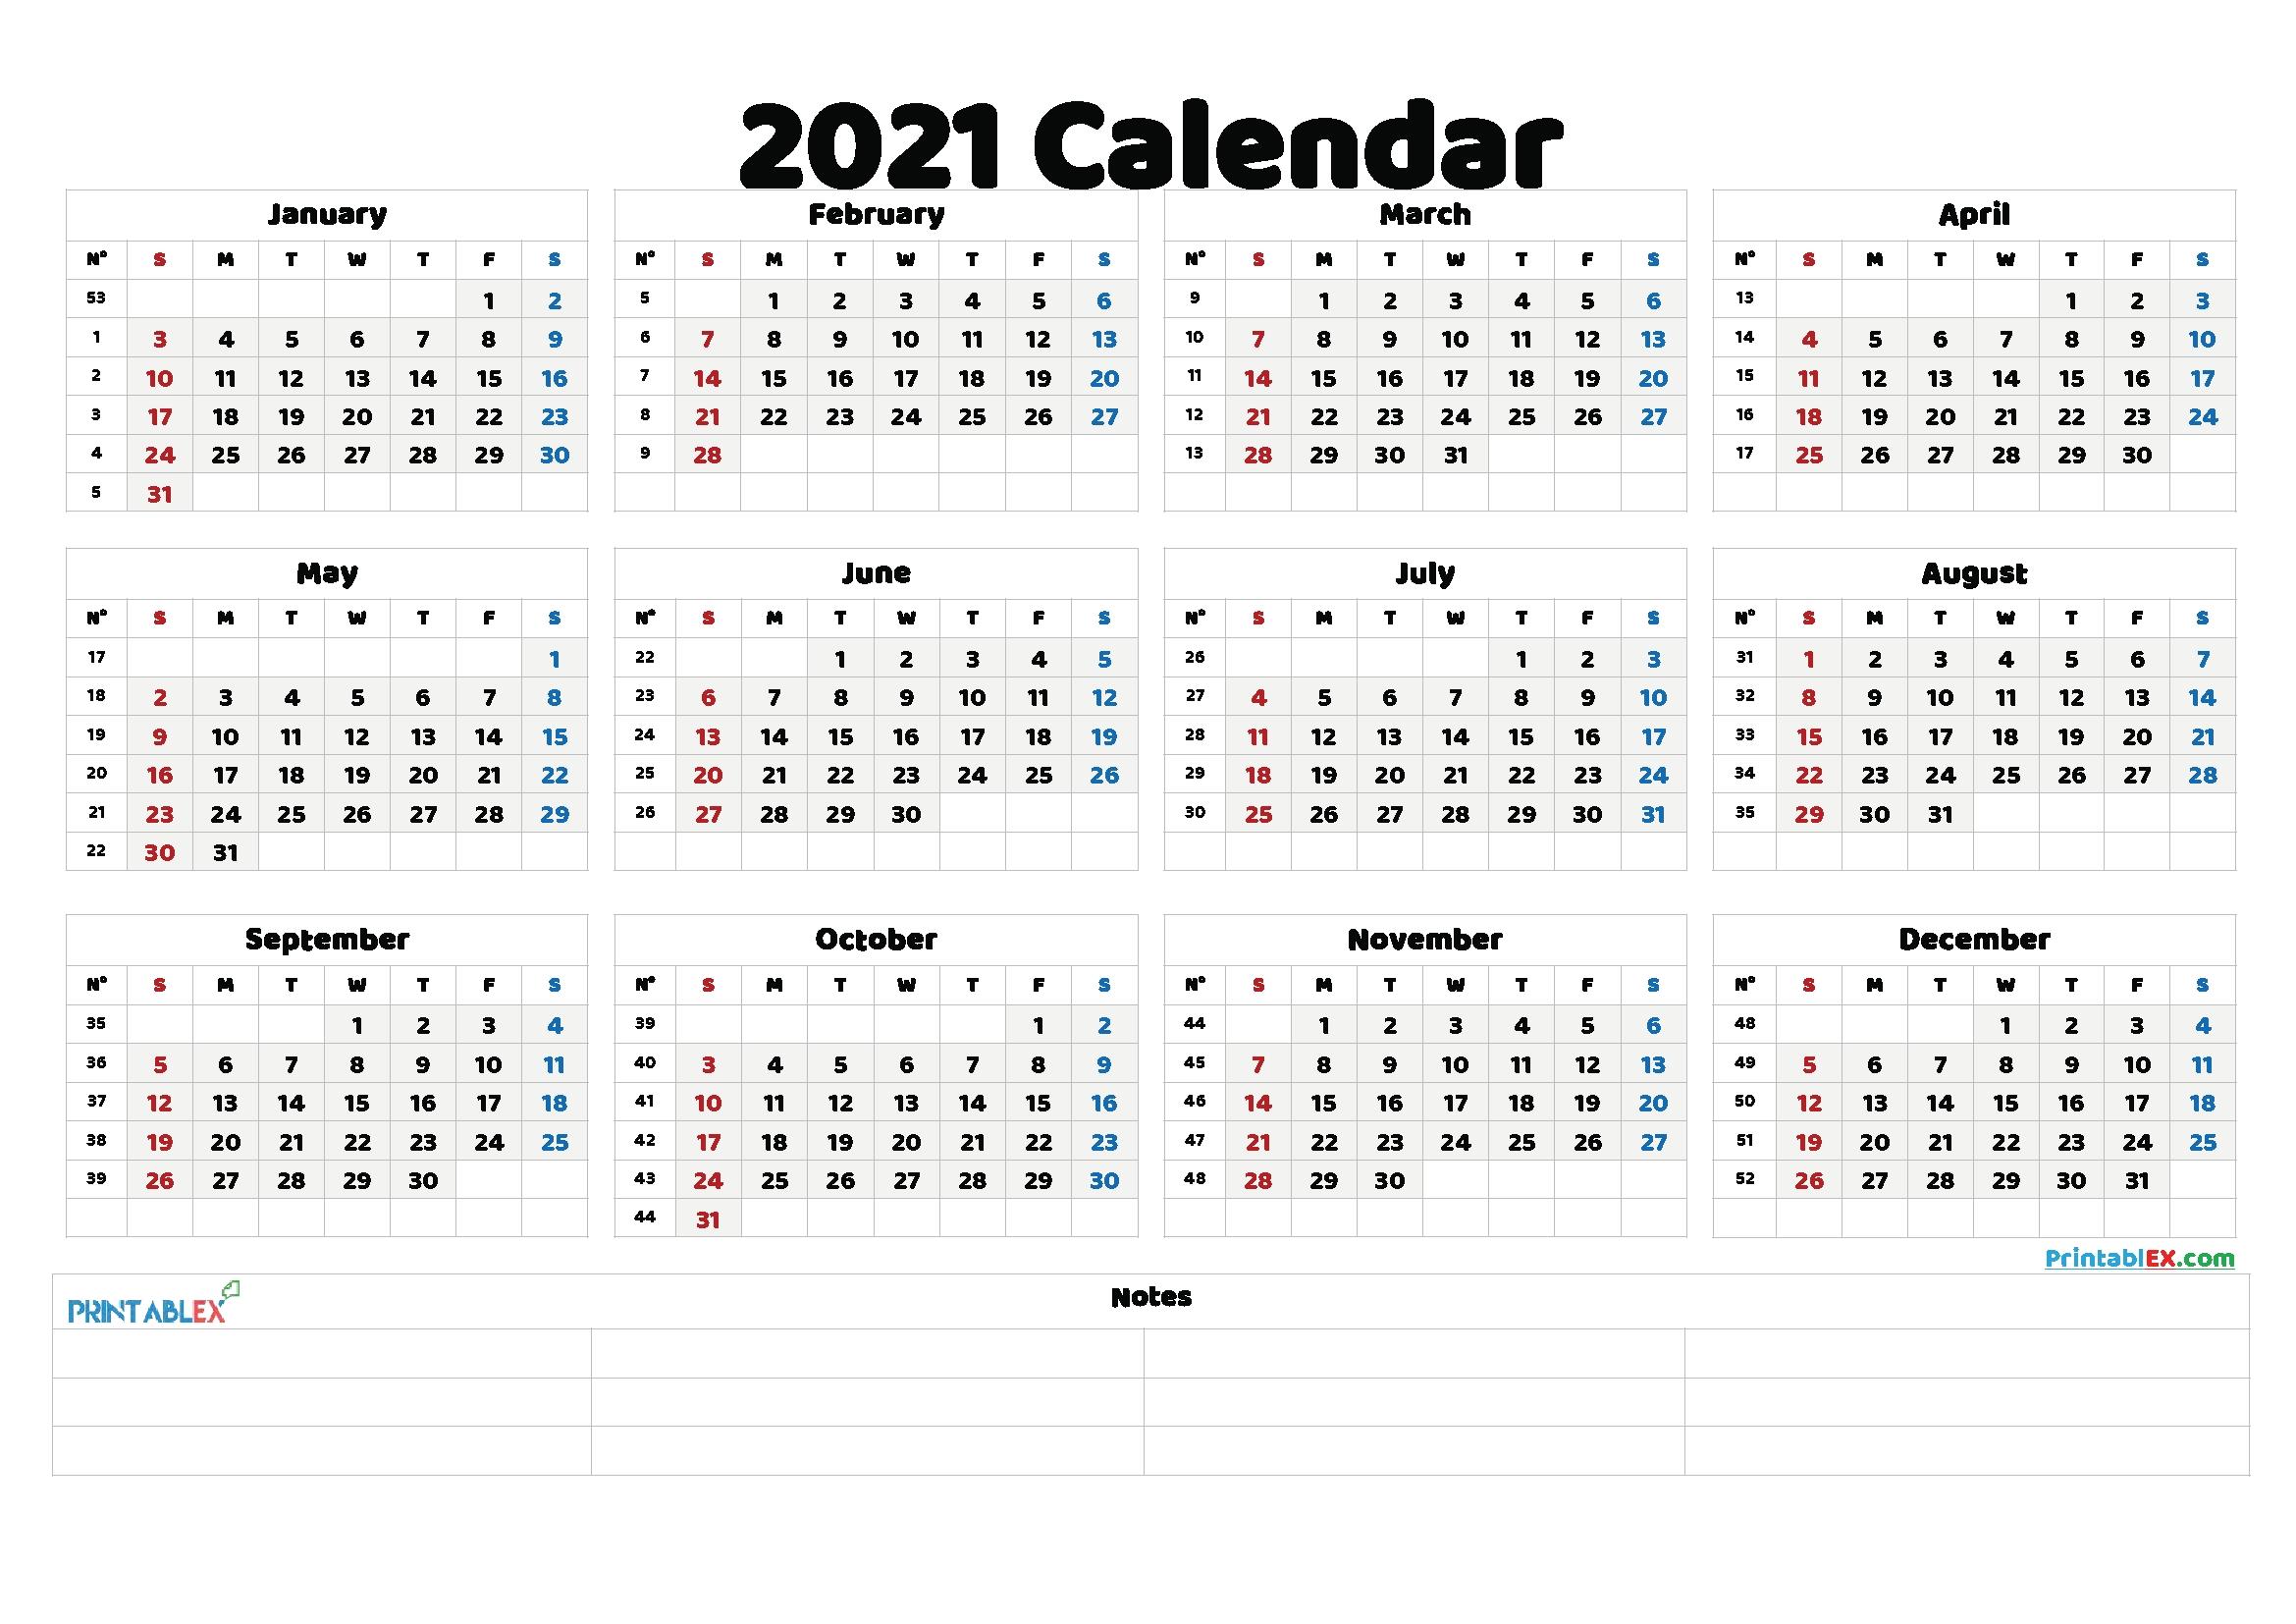 Free Printable Numbers For Calendar | Ten Free Printable ...